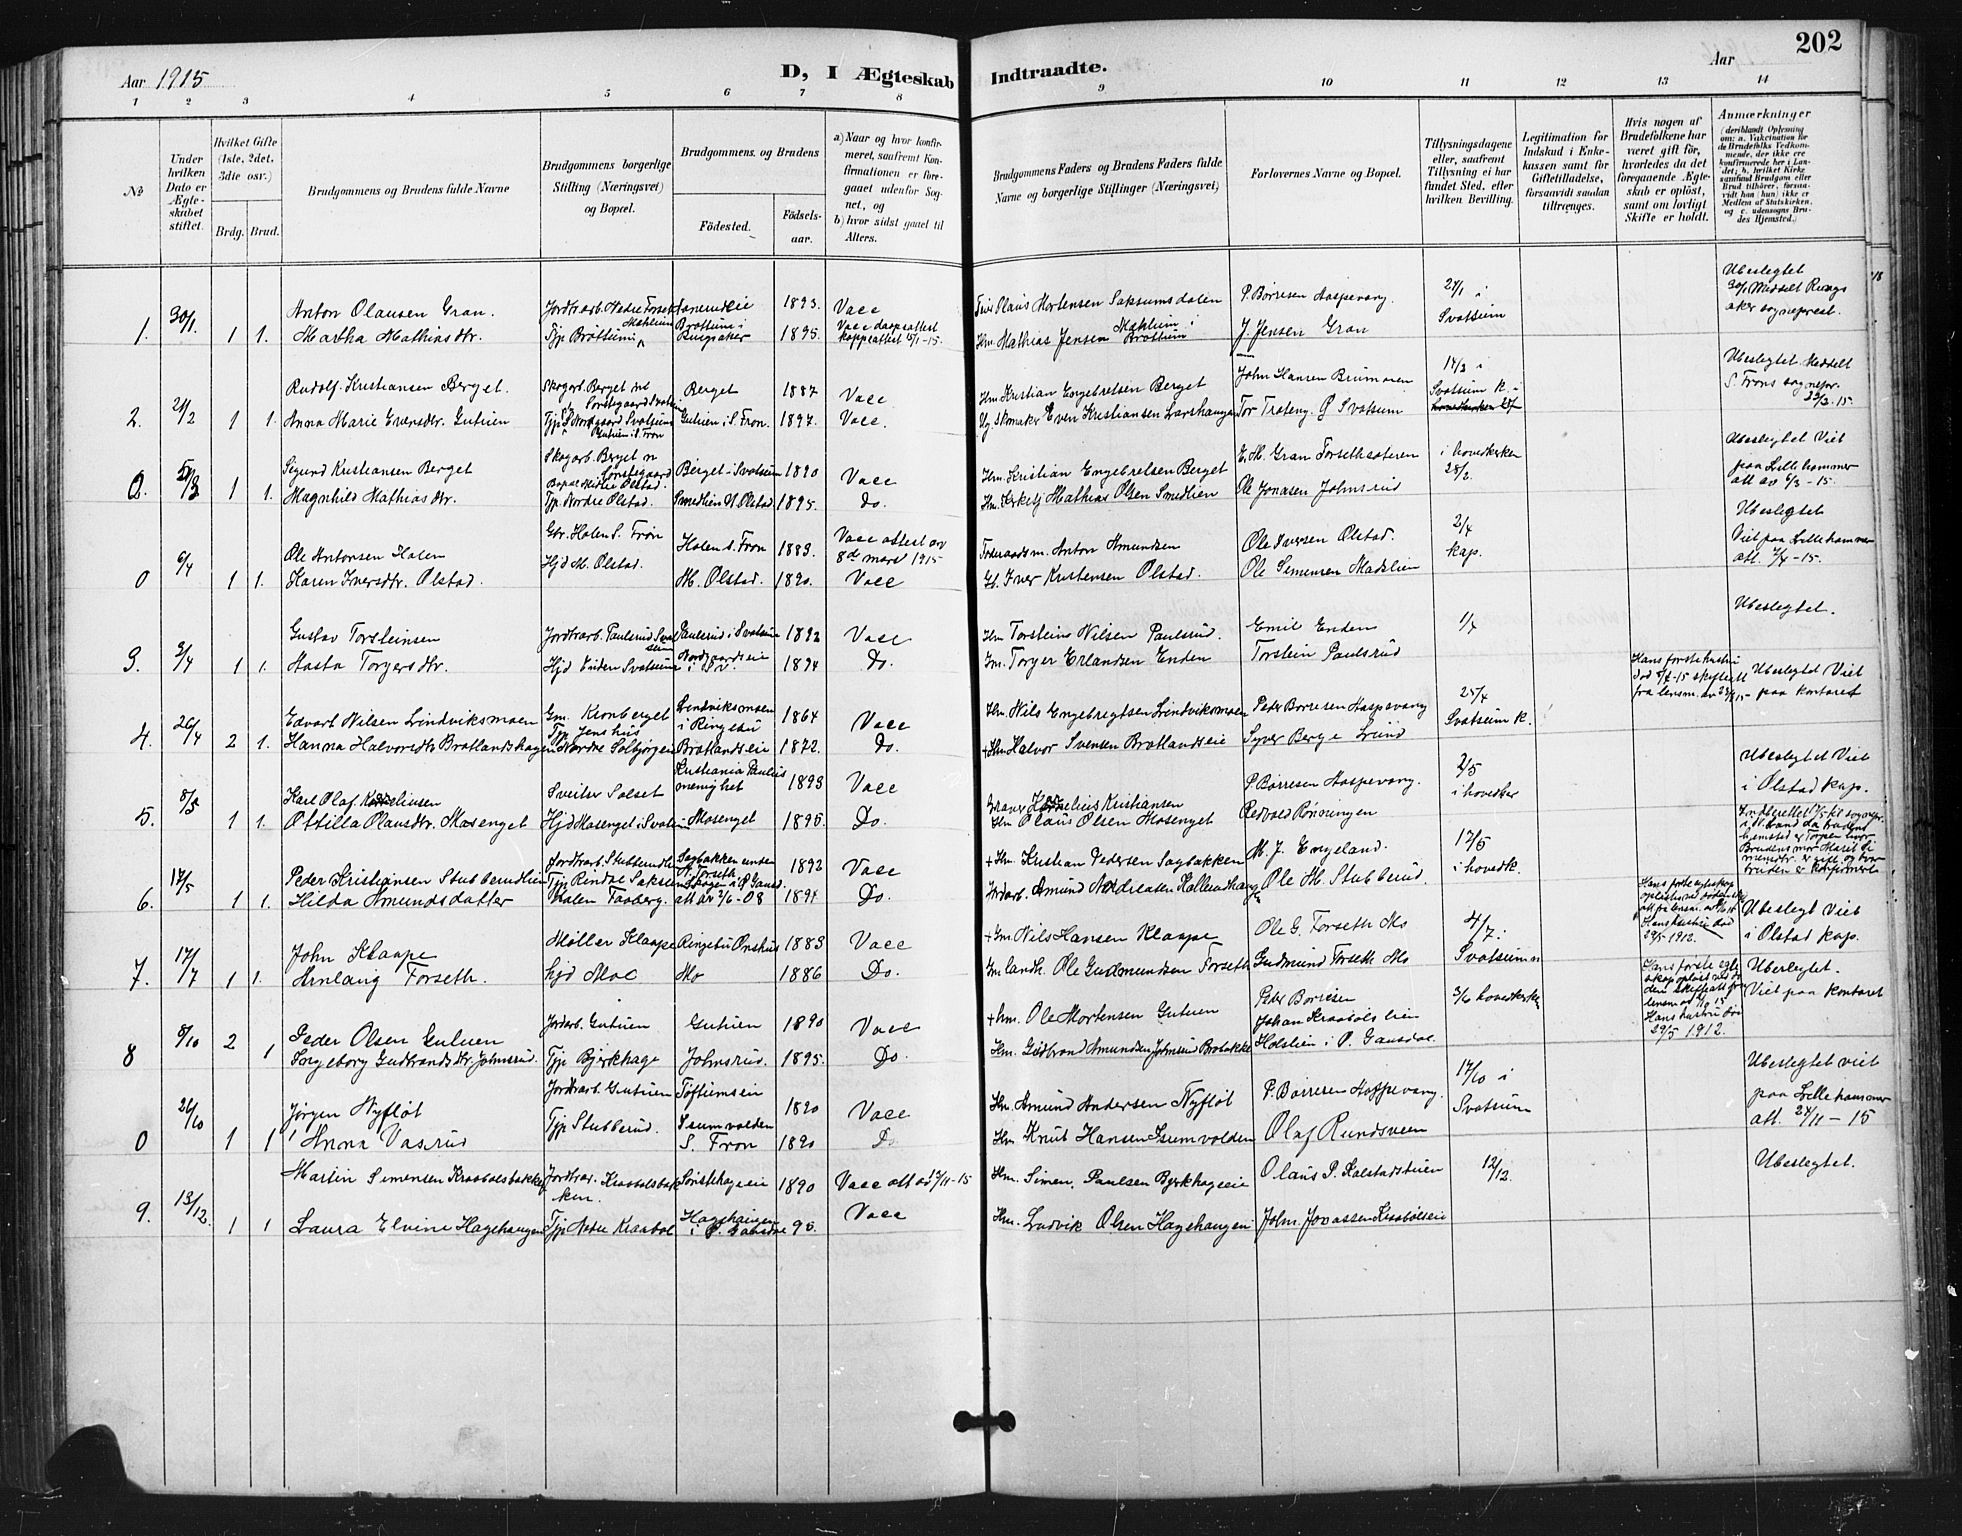 SAH, Vestre Gausdal prestekontor, Klokkerbok nr. 3, 1896-1925, s. 202